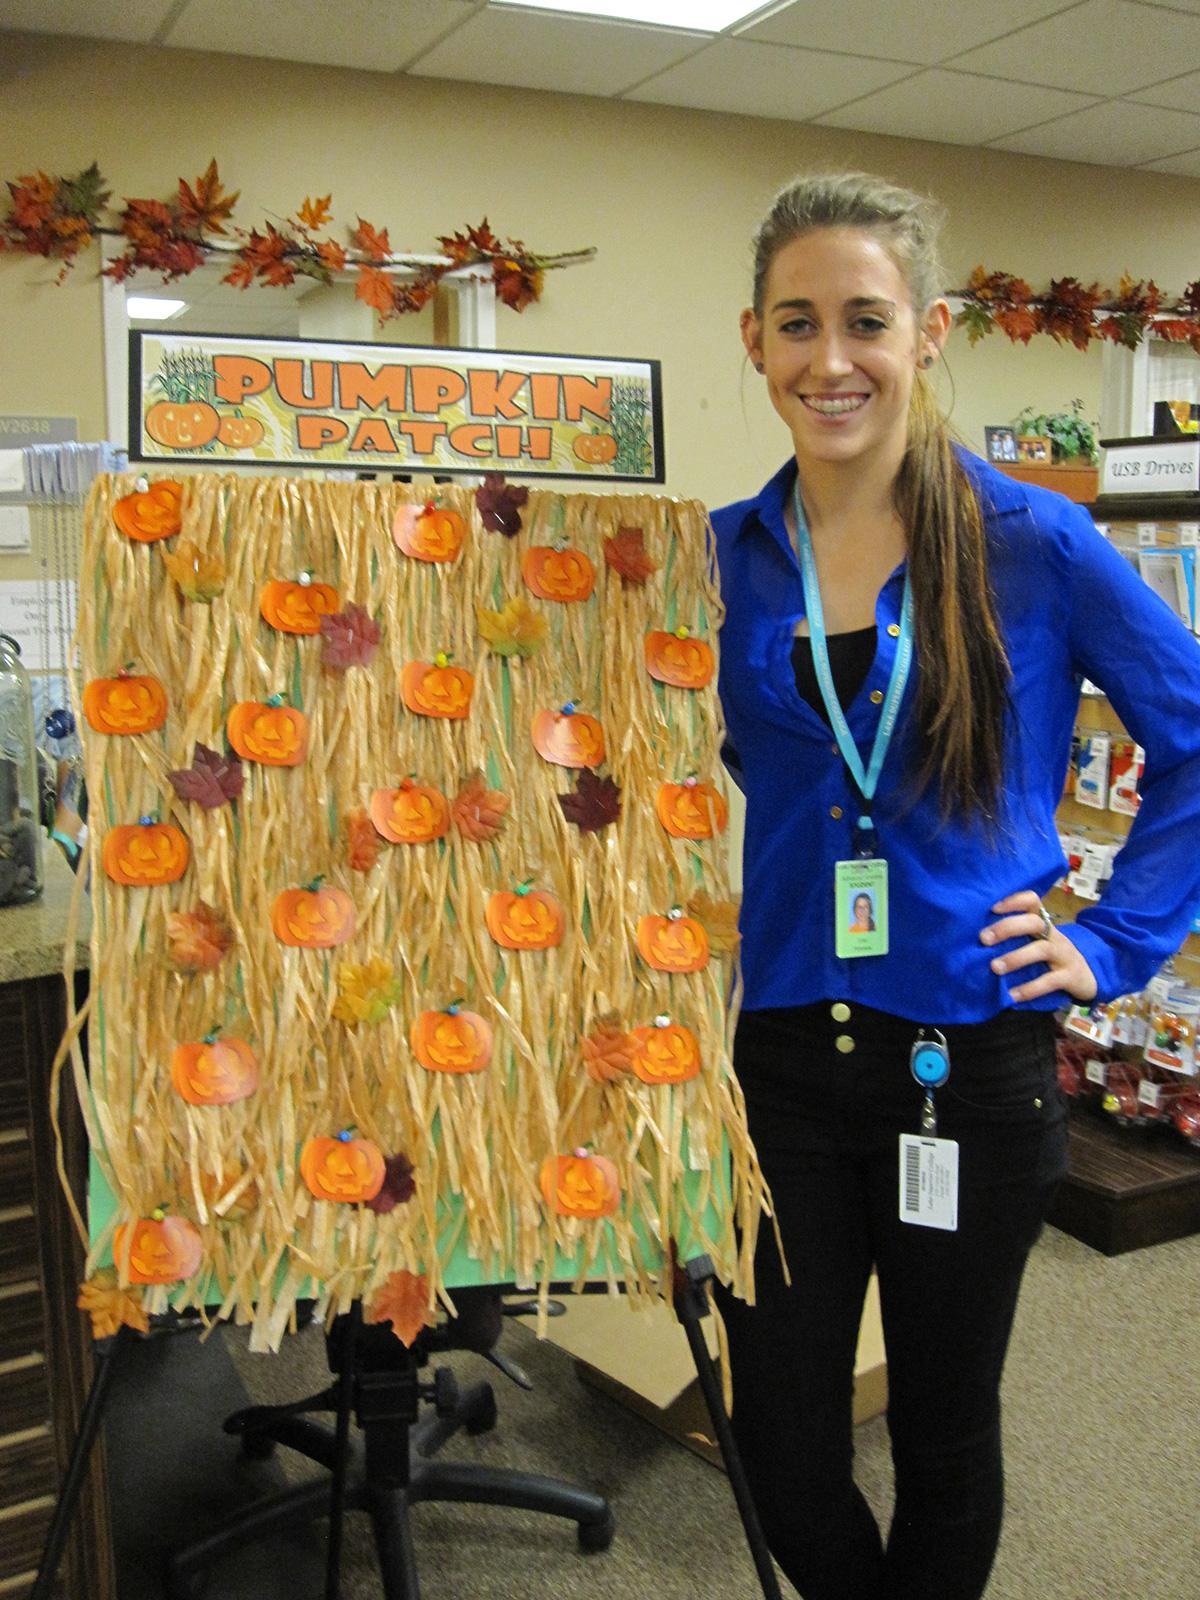 Pick-a-pumpkin with LSC Bookstore